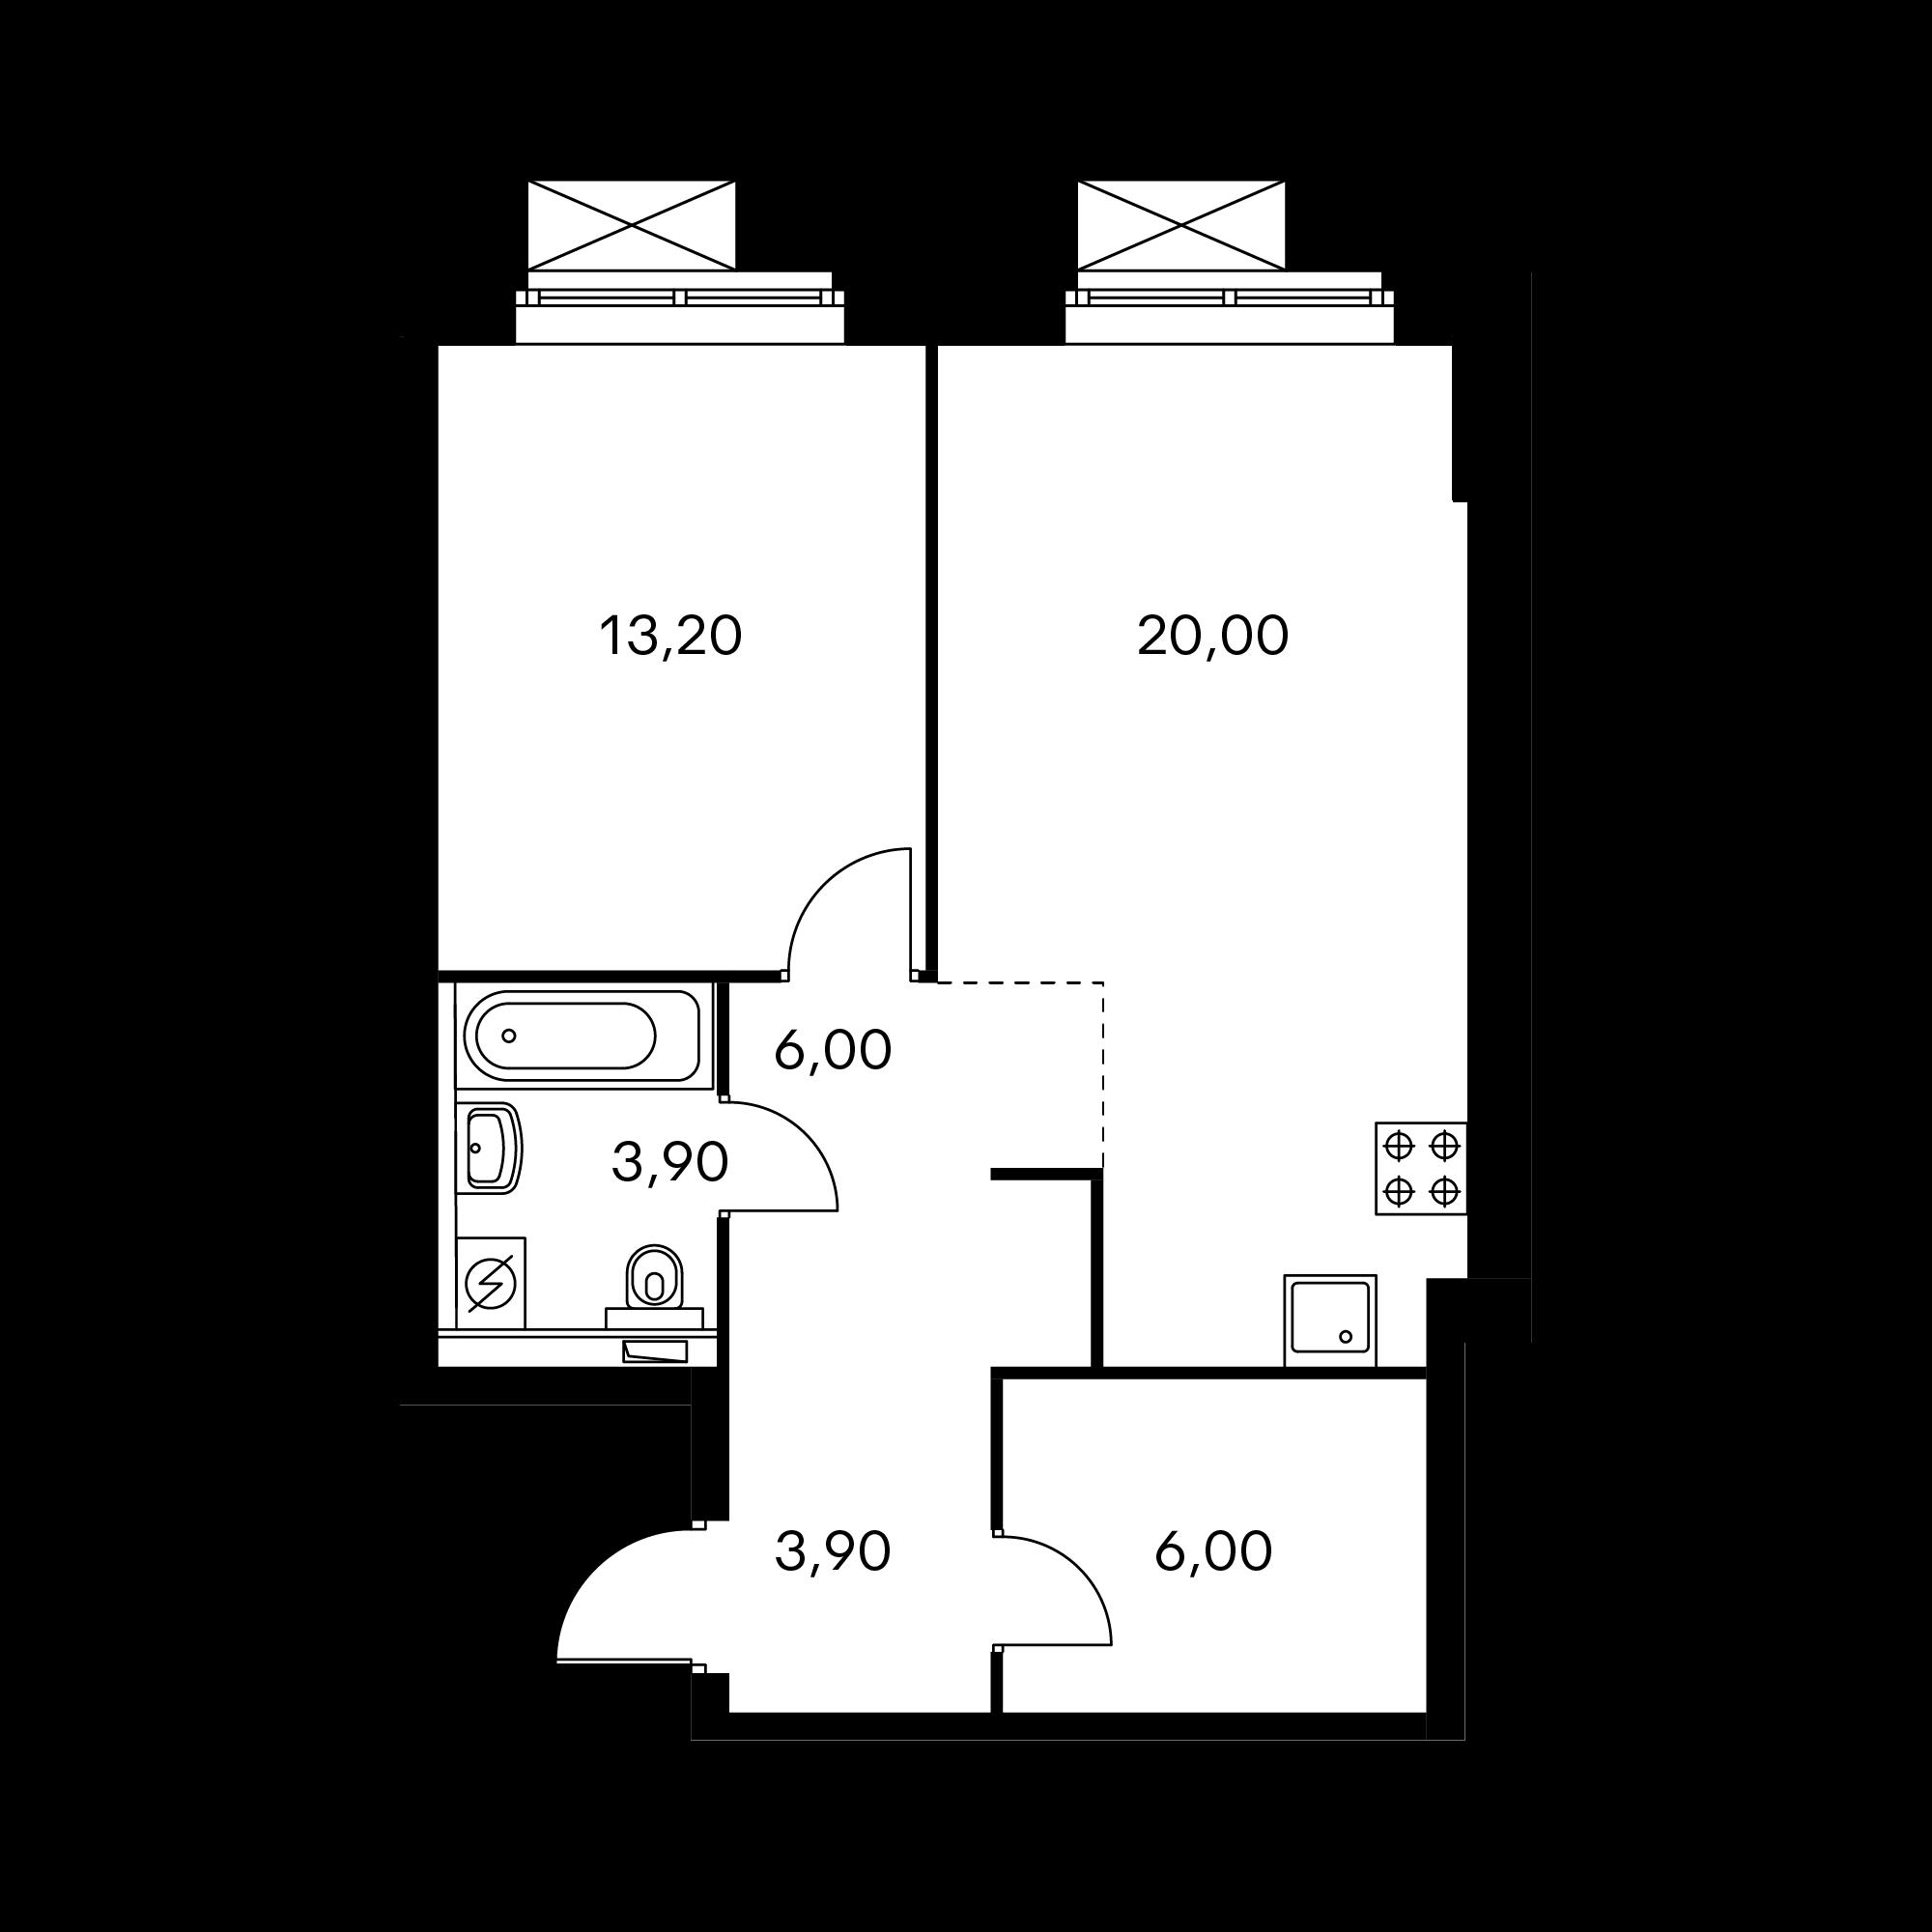 1EL2_6.9-1